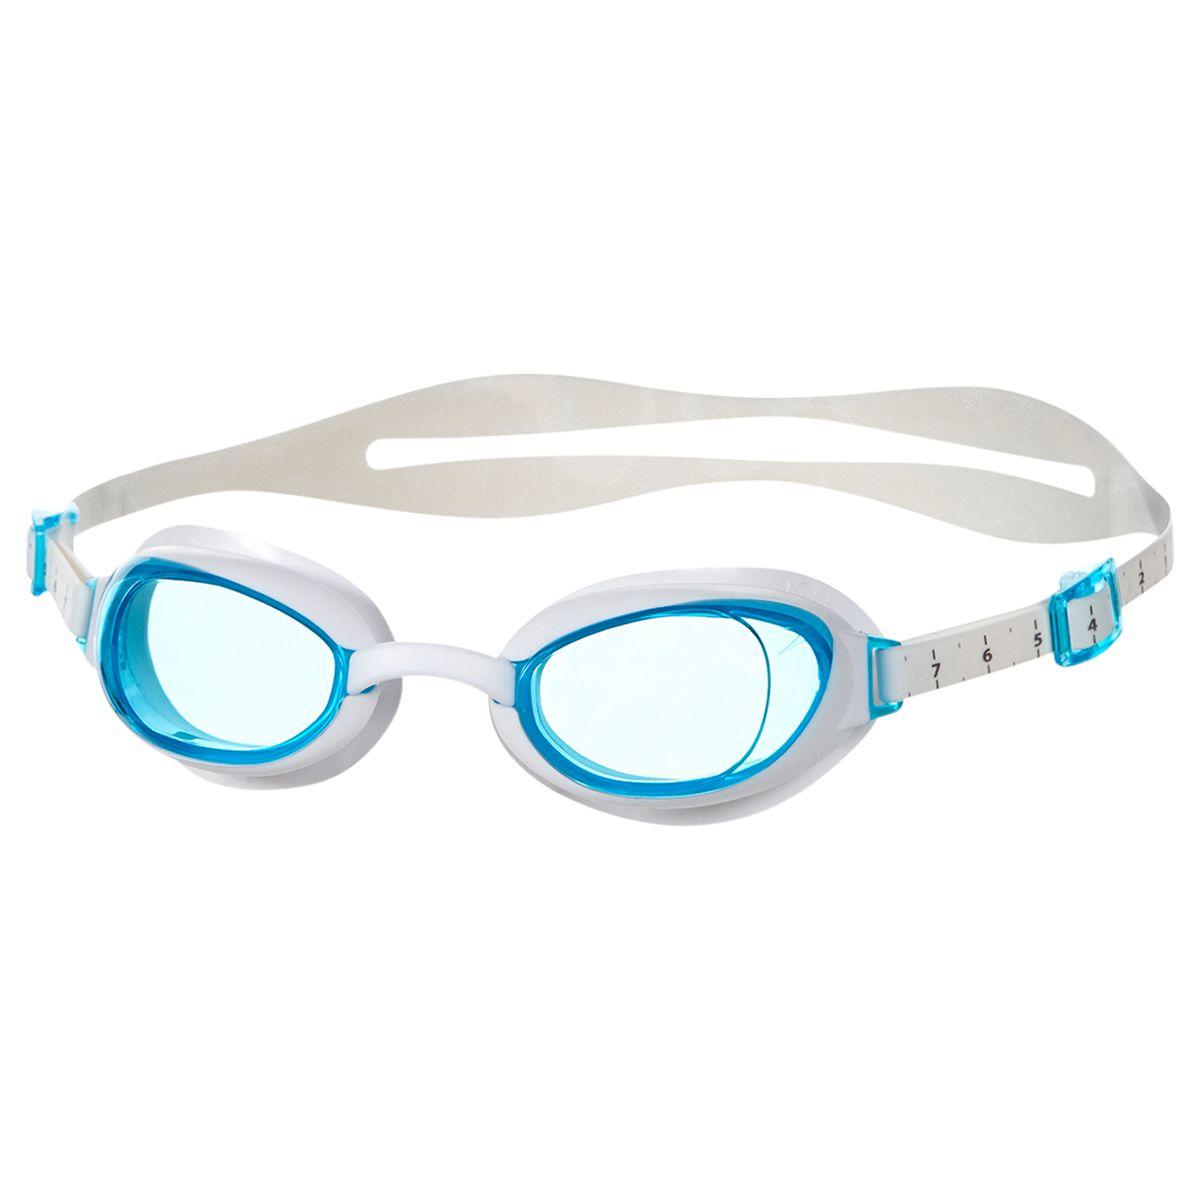 Speedo Speedo Women's Aquapure IQfit Goggles, Blue/White